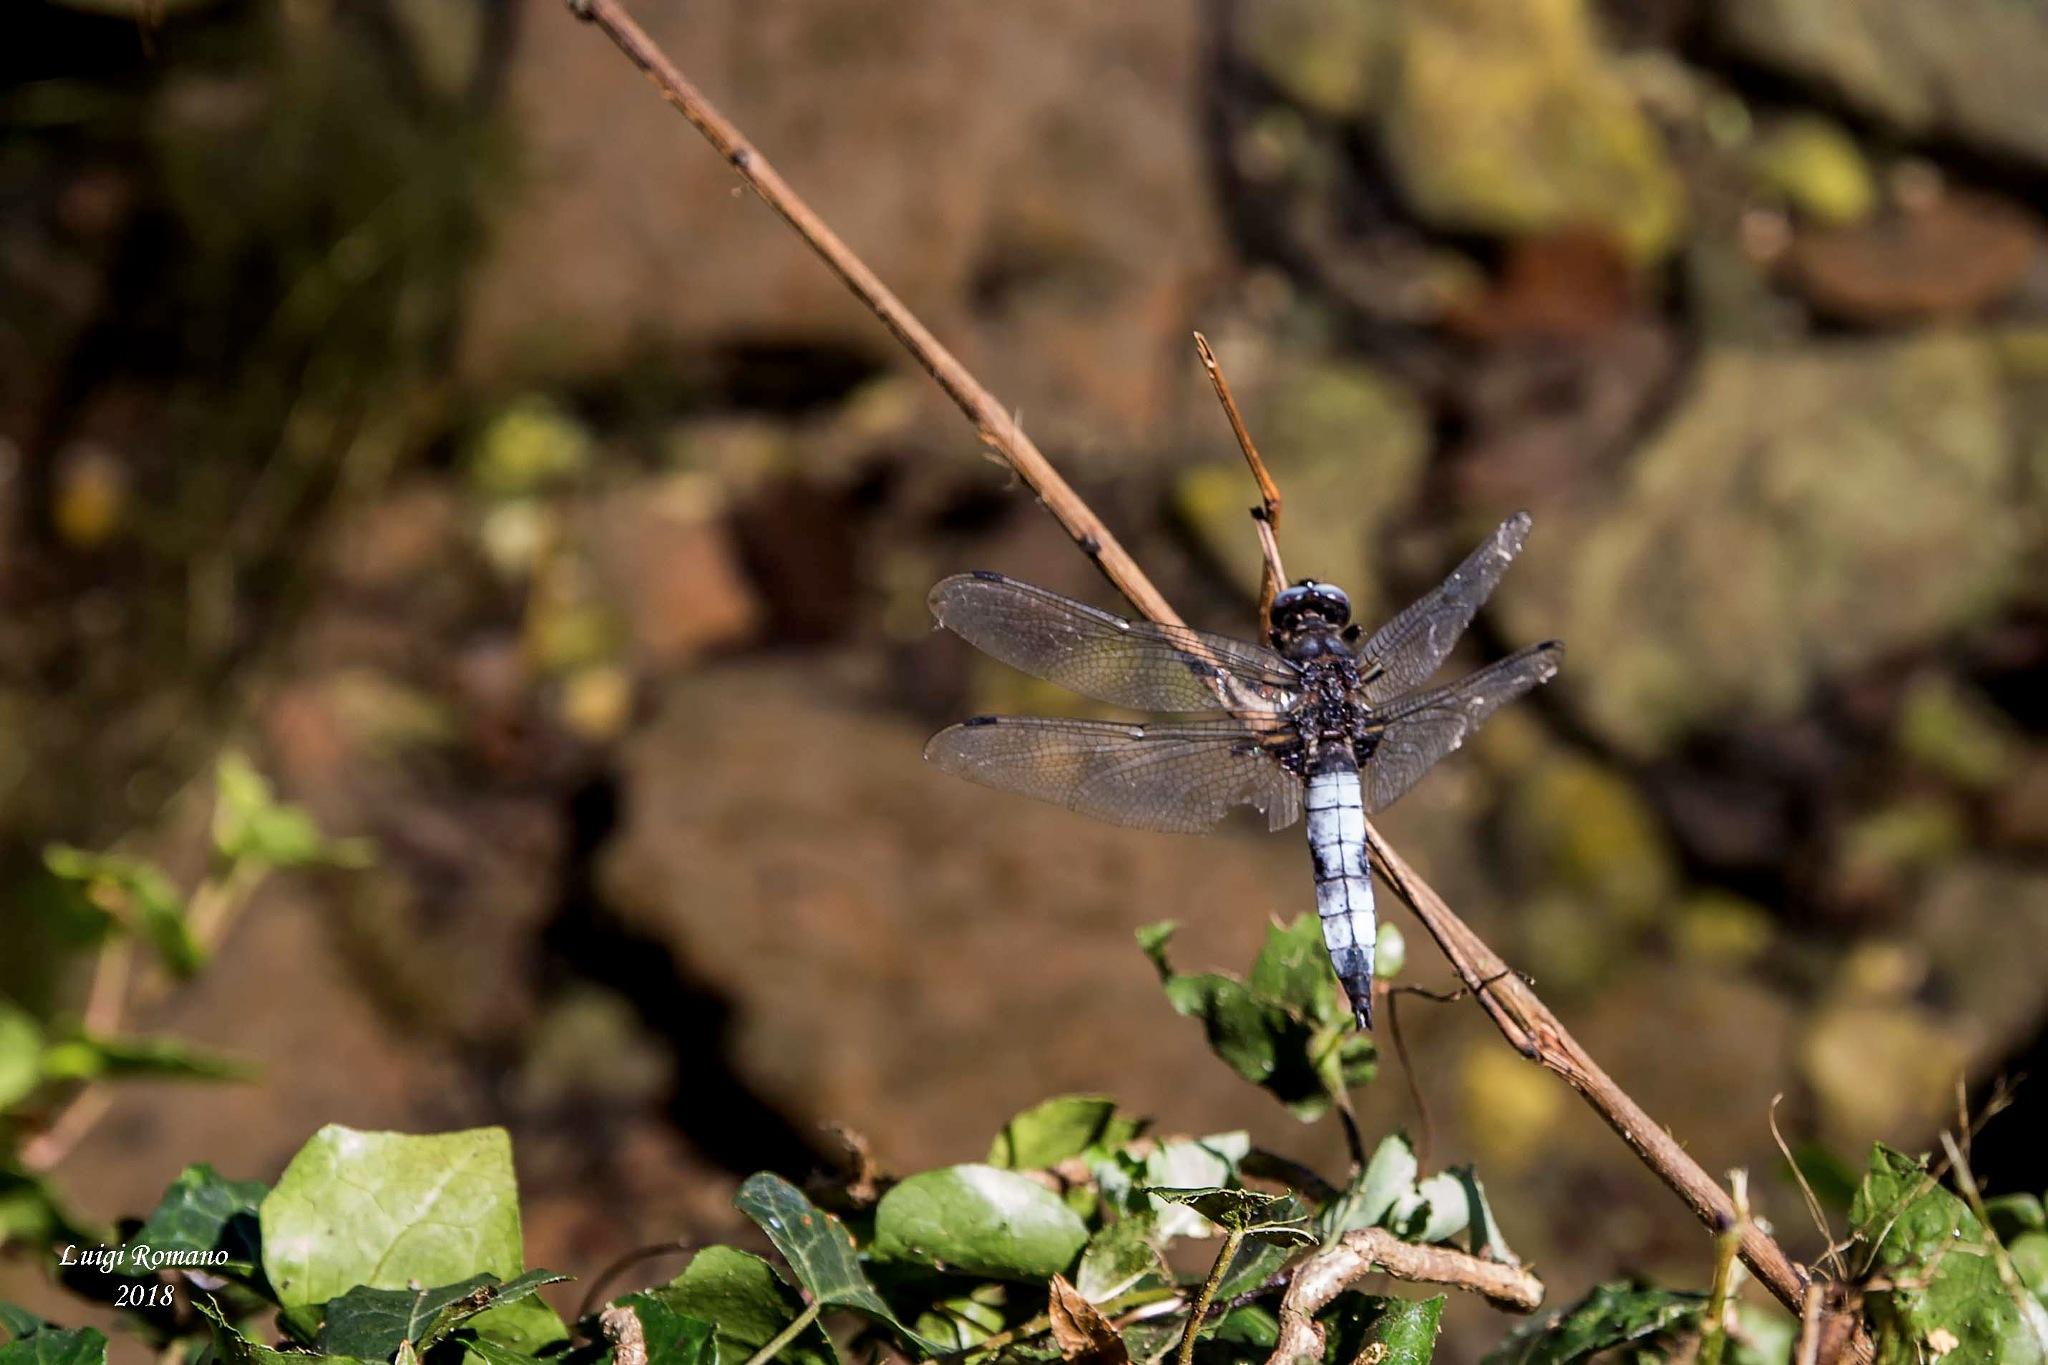 Dragonfly by Luigi Romano